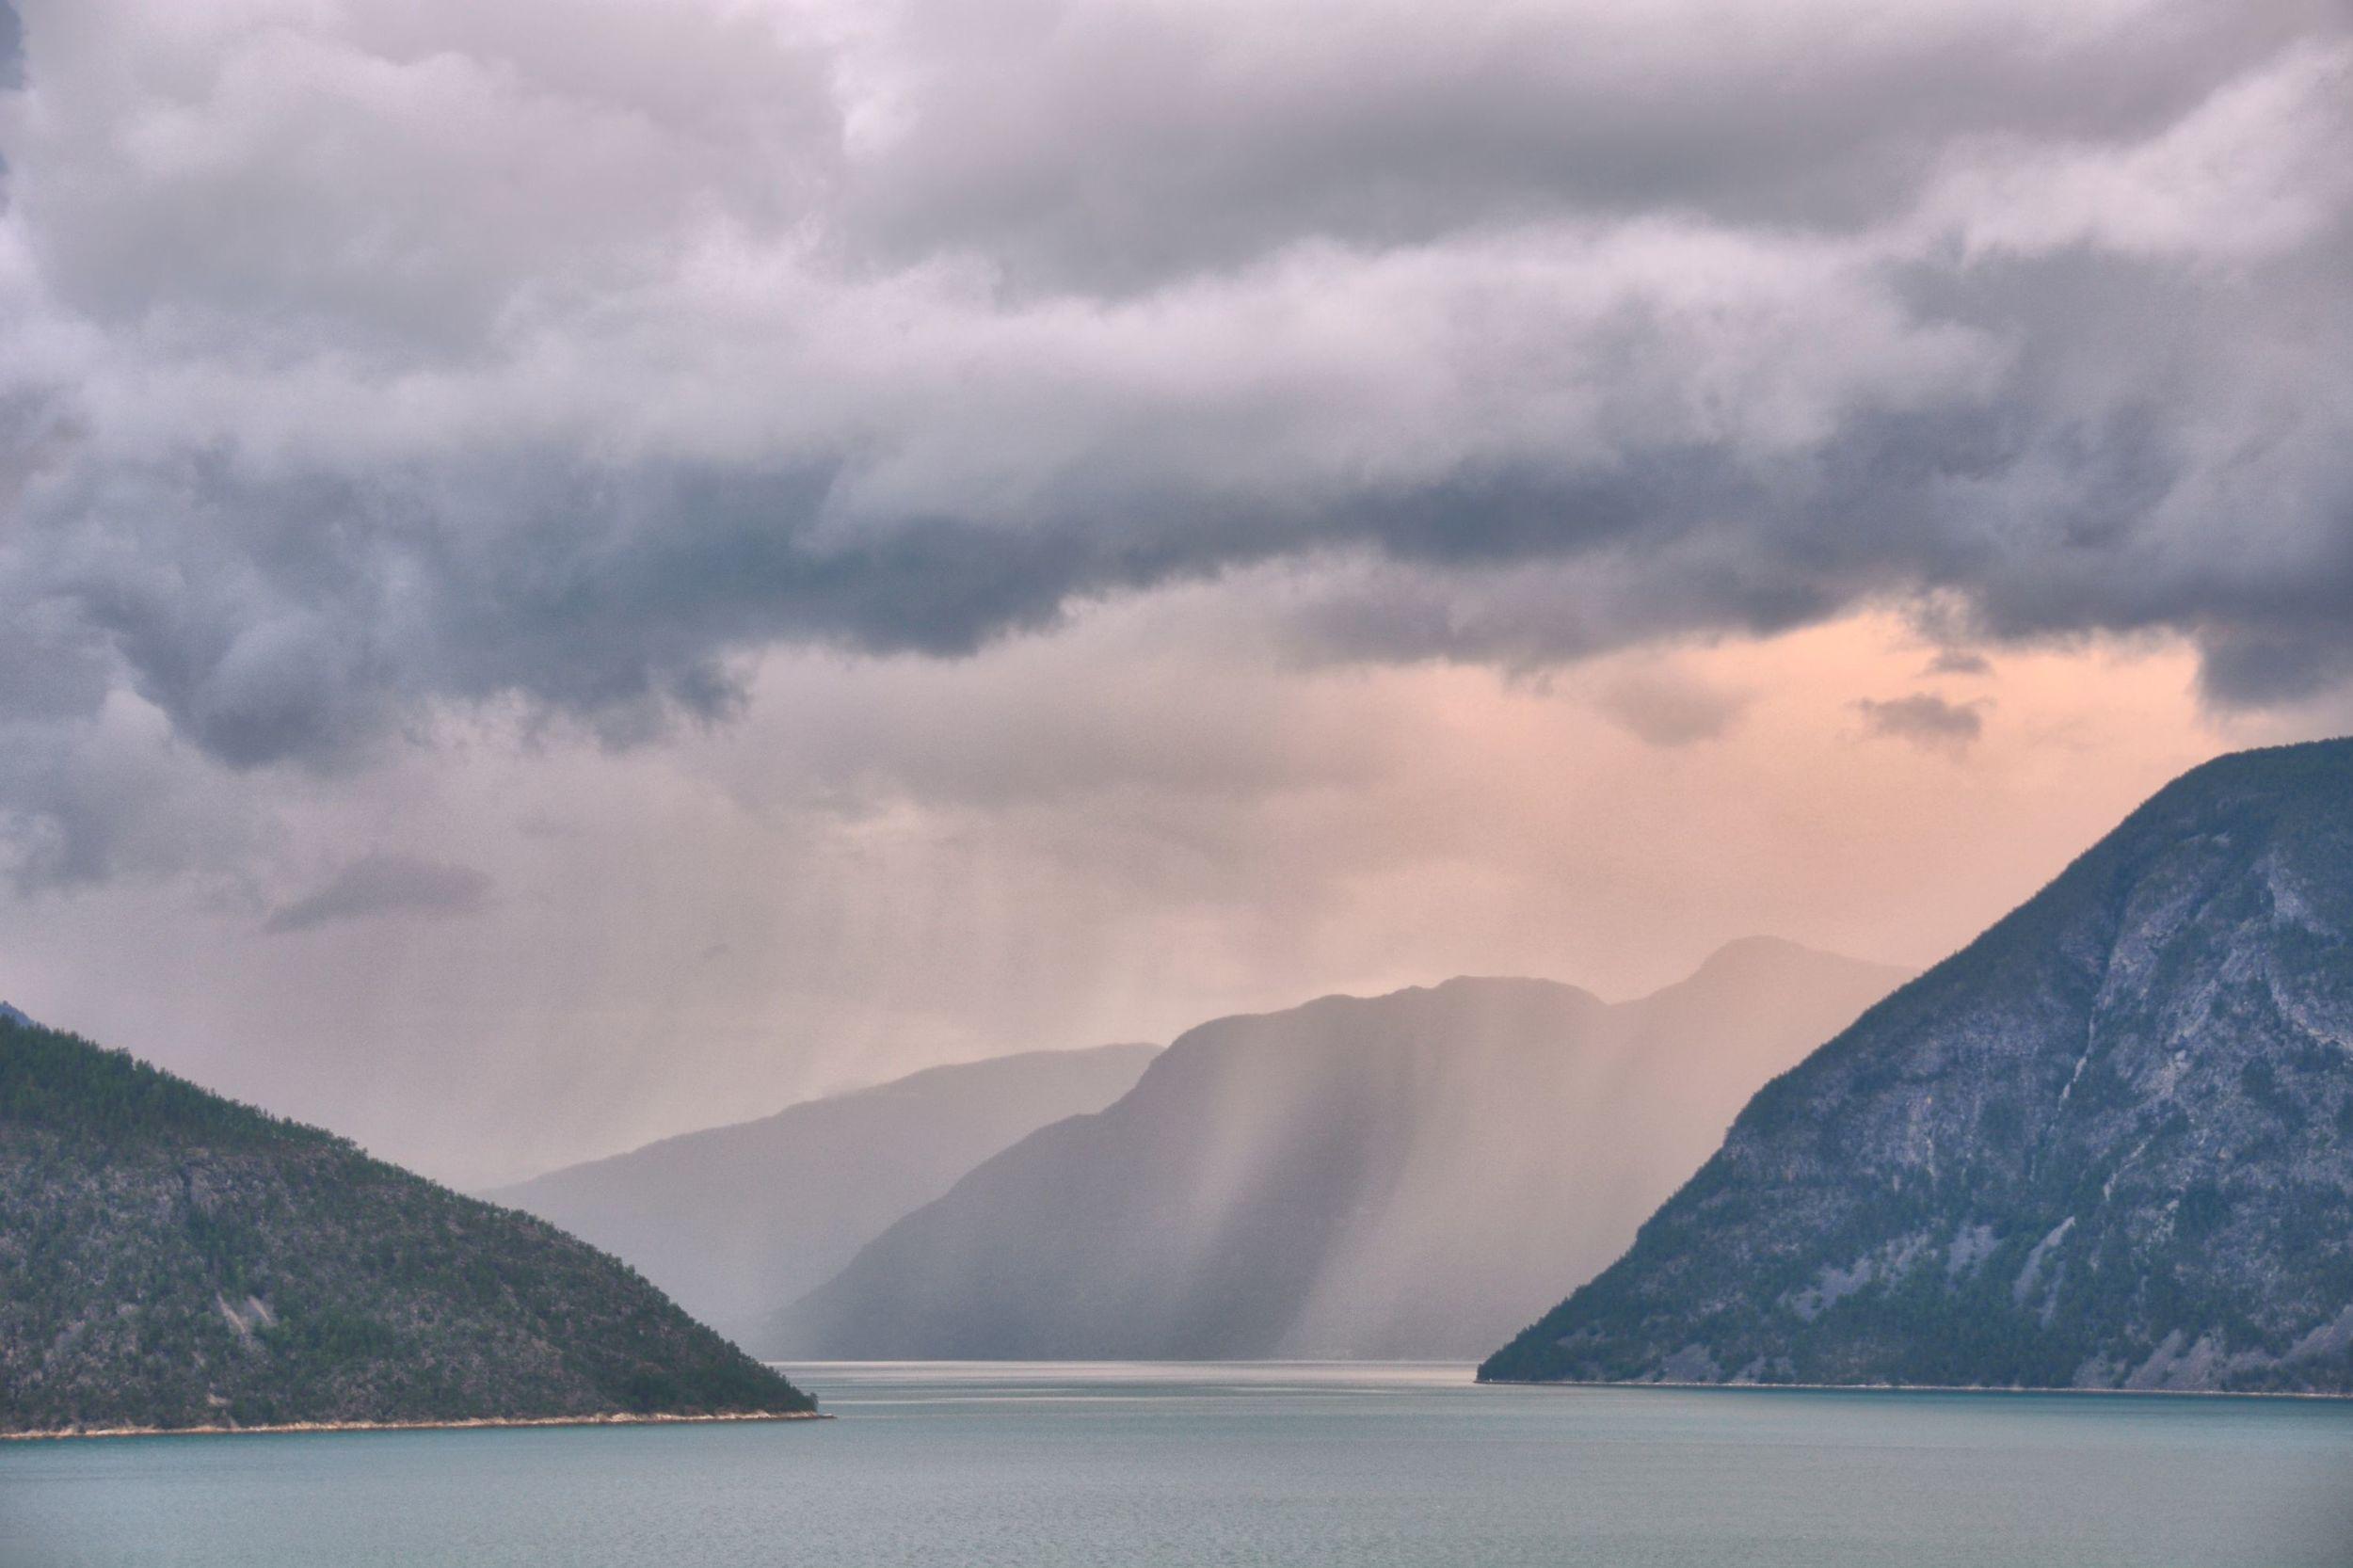 Storm and Light over Lustrafjorden